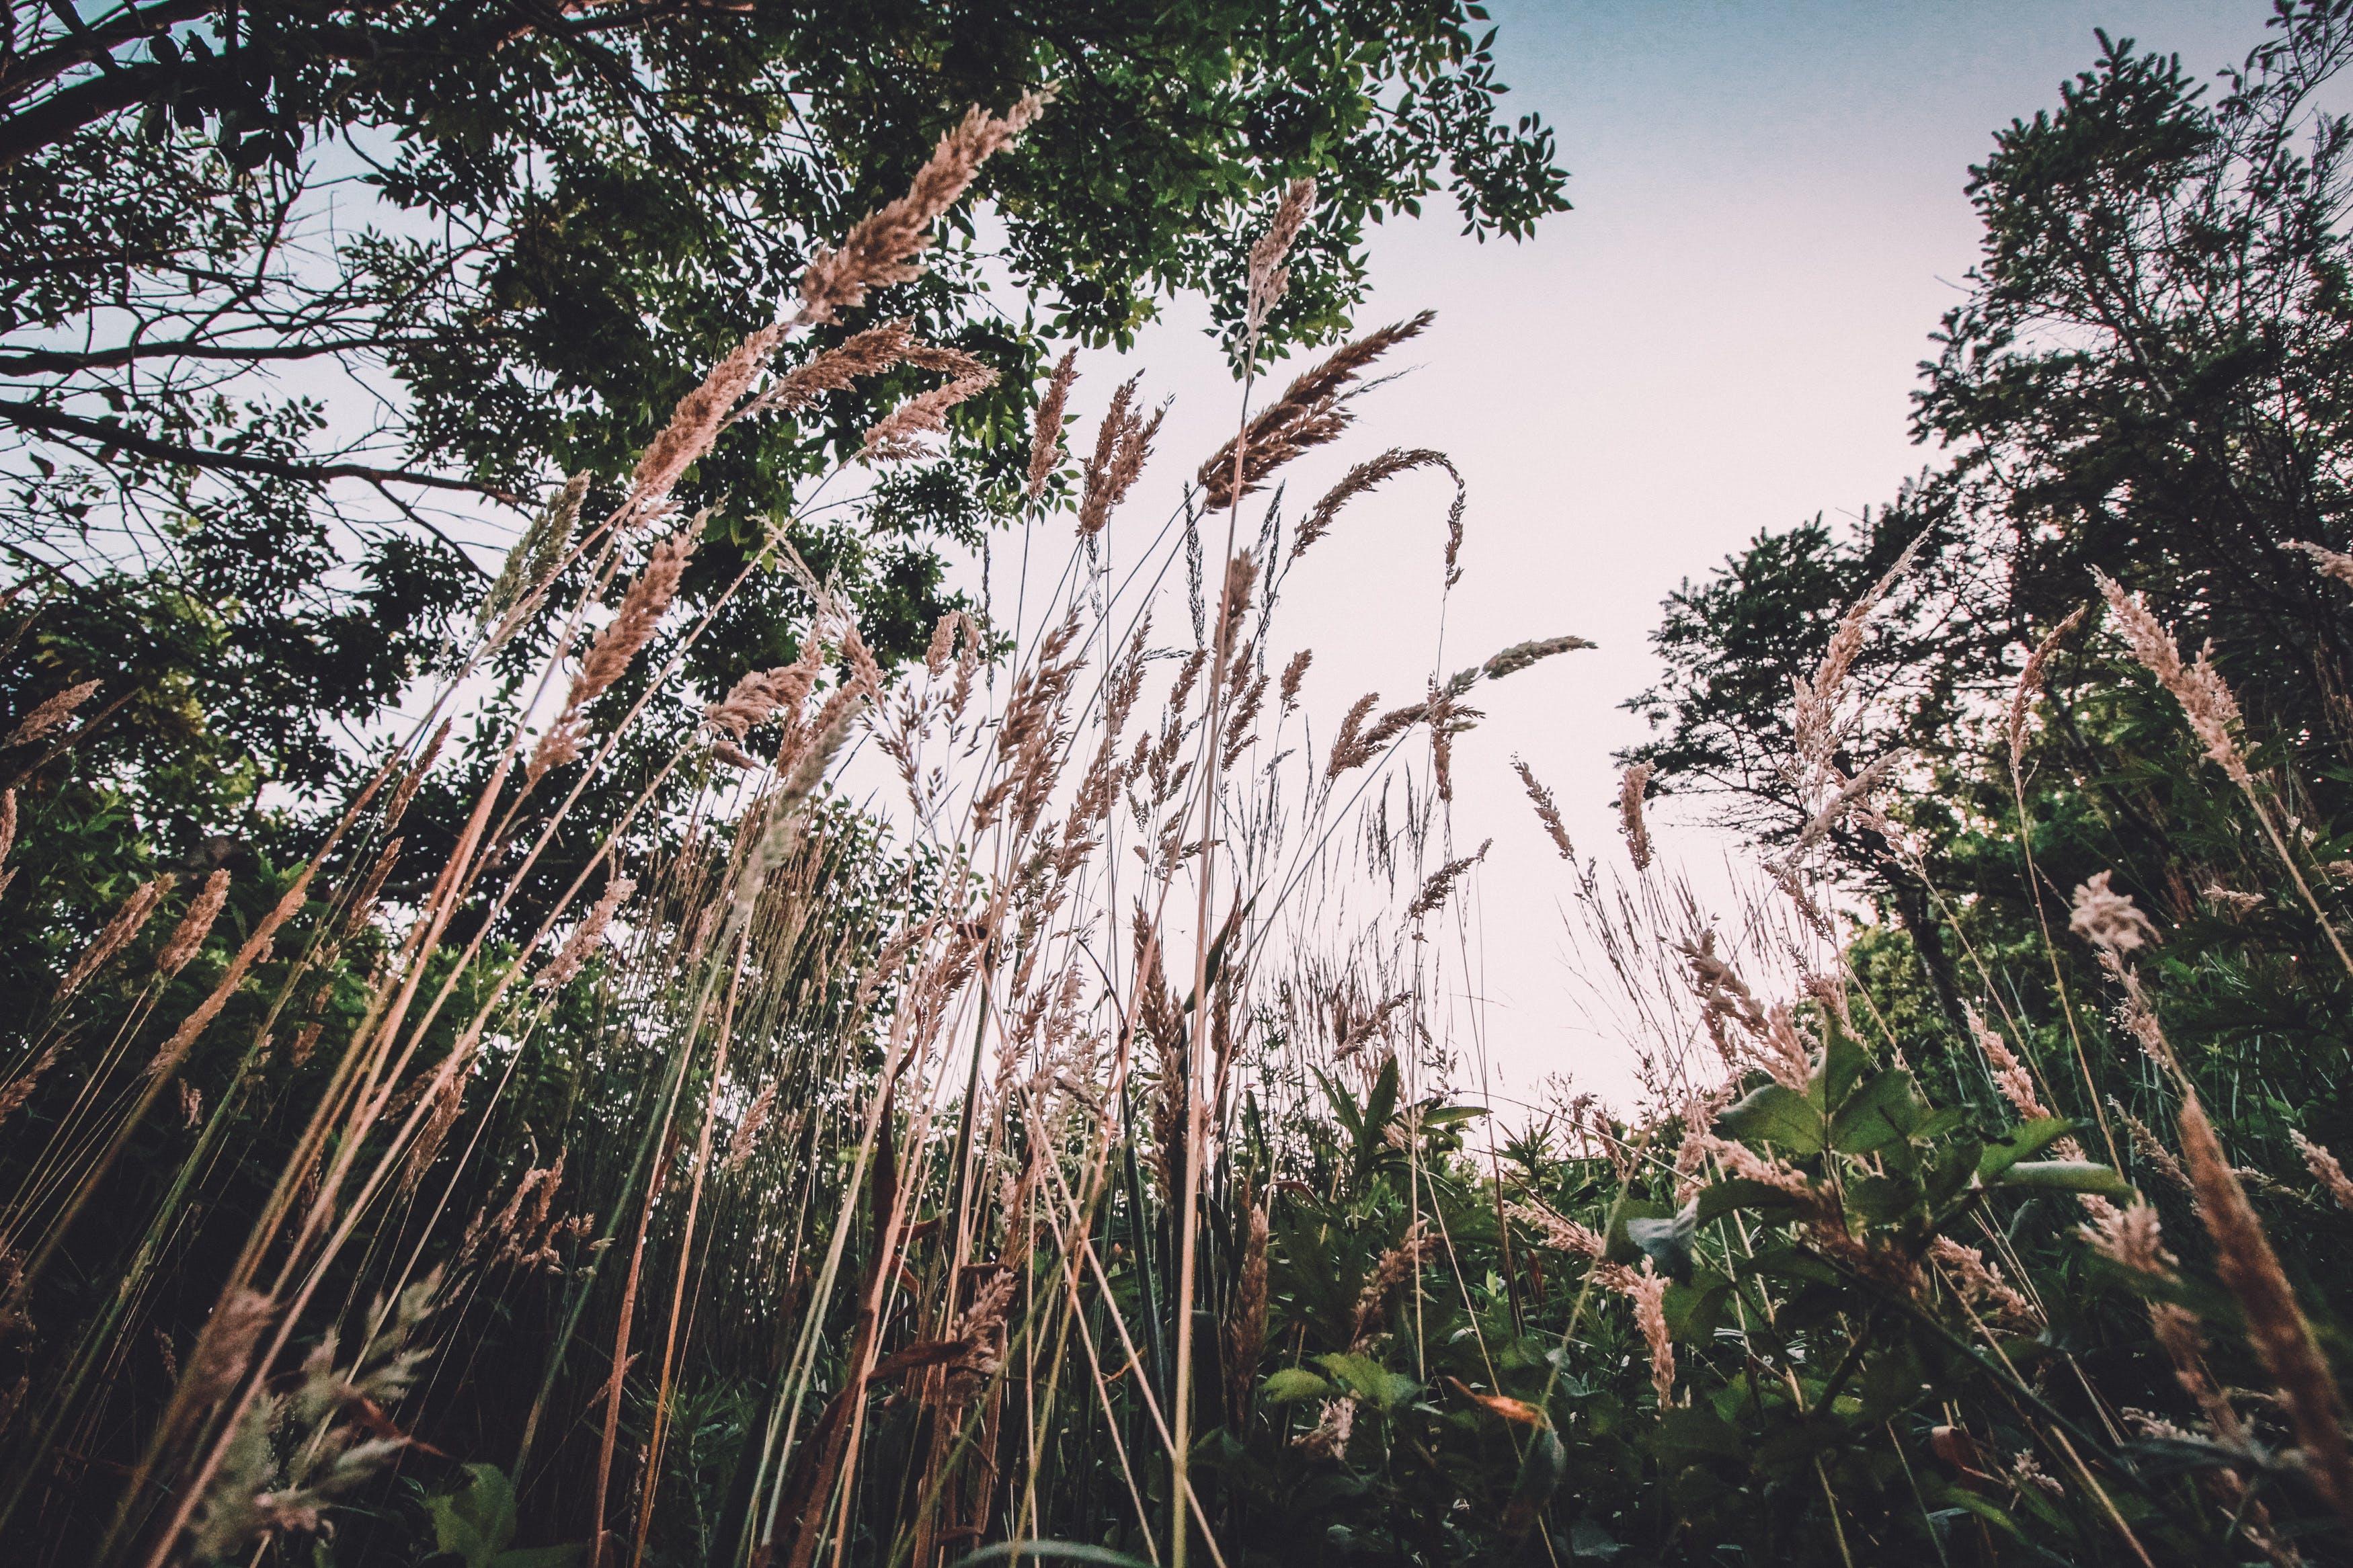 Free stock photo of blades of grass, blue sky, dark green, dark green plants